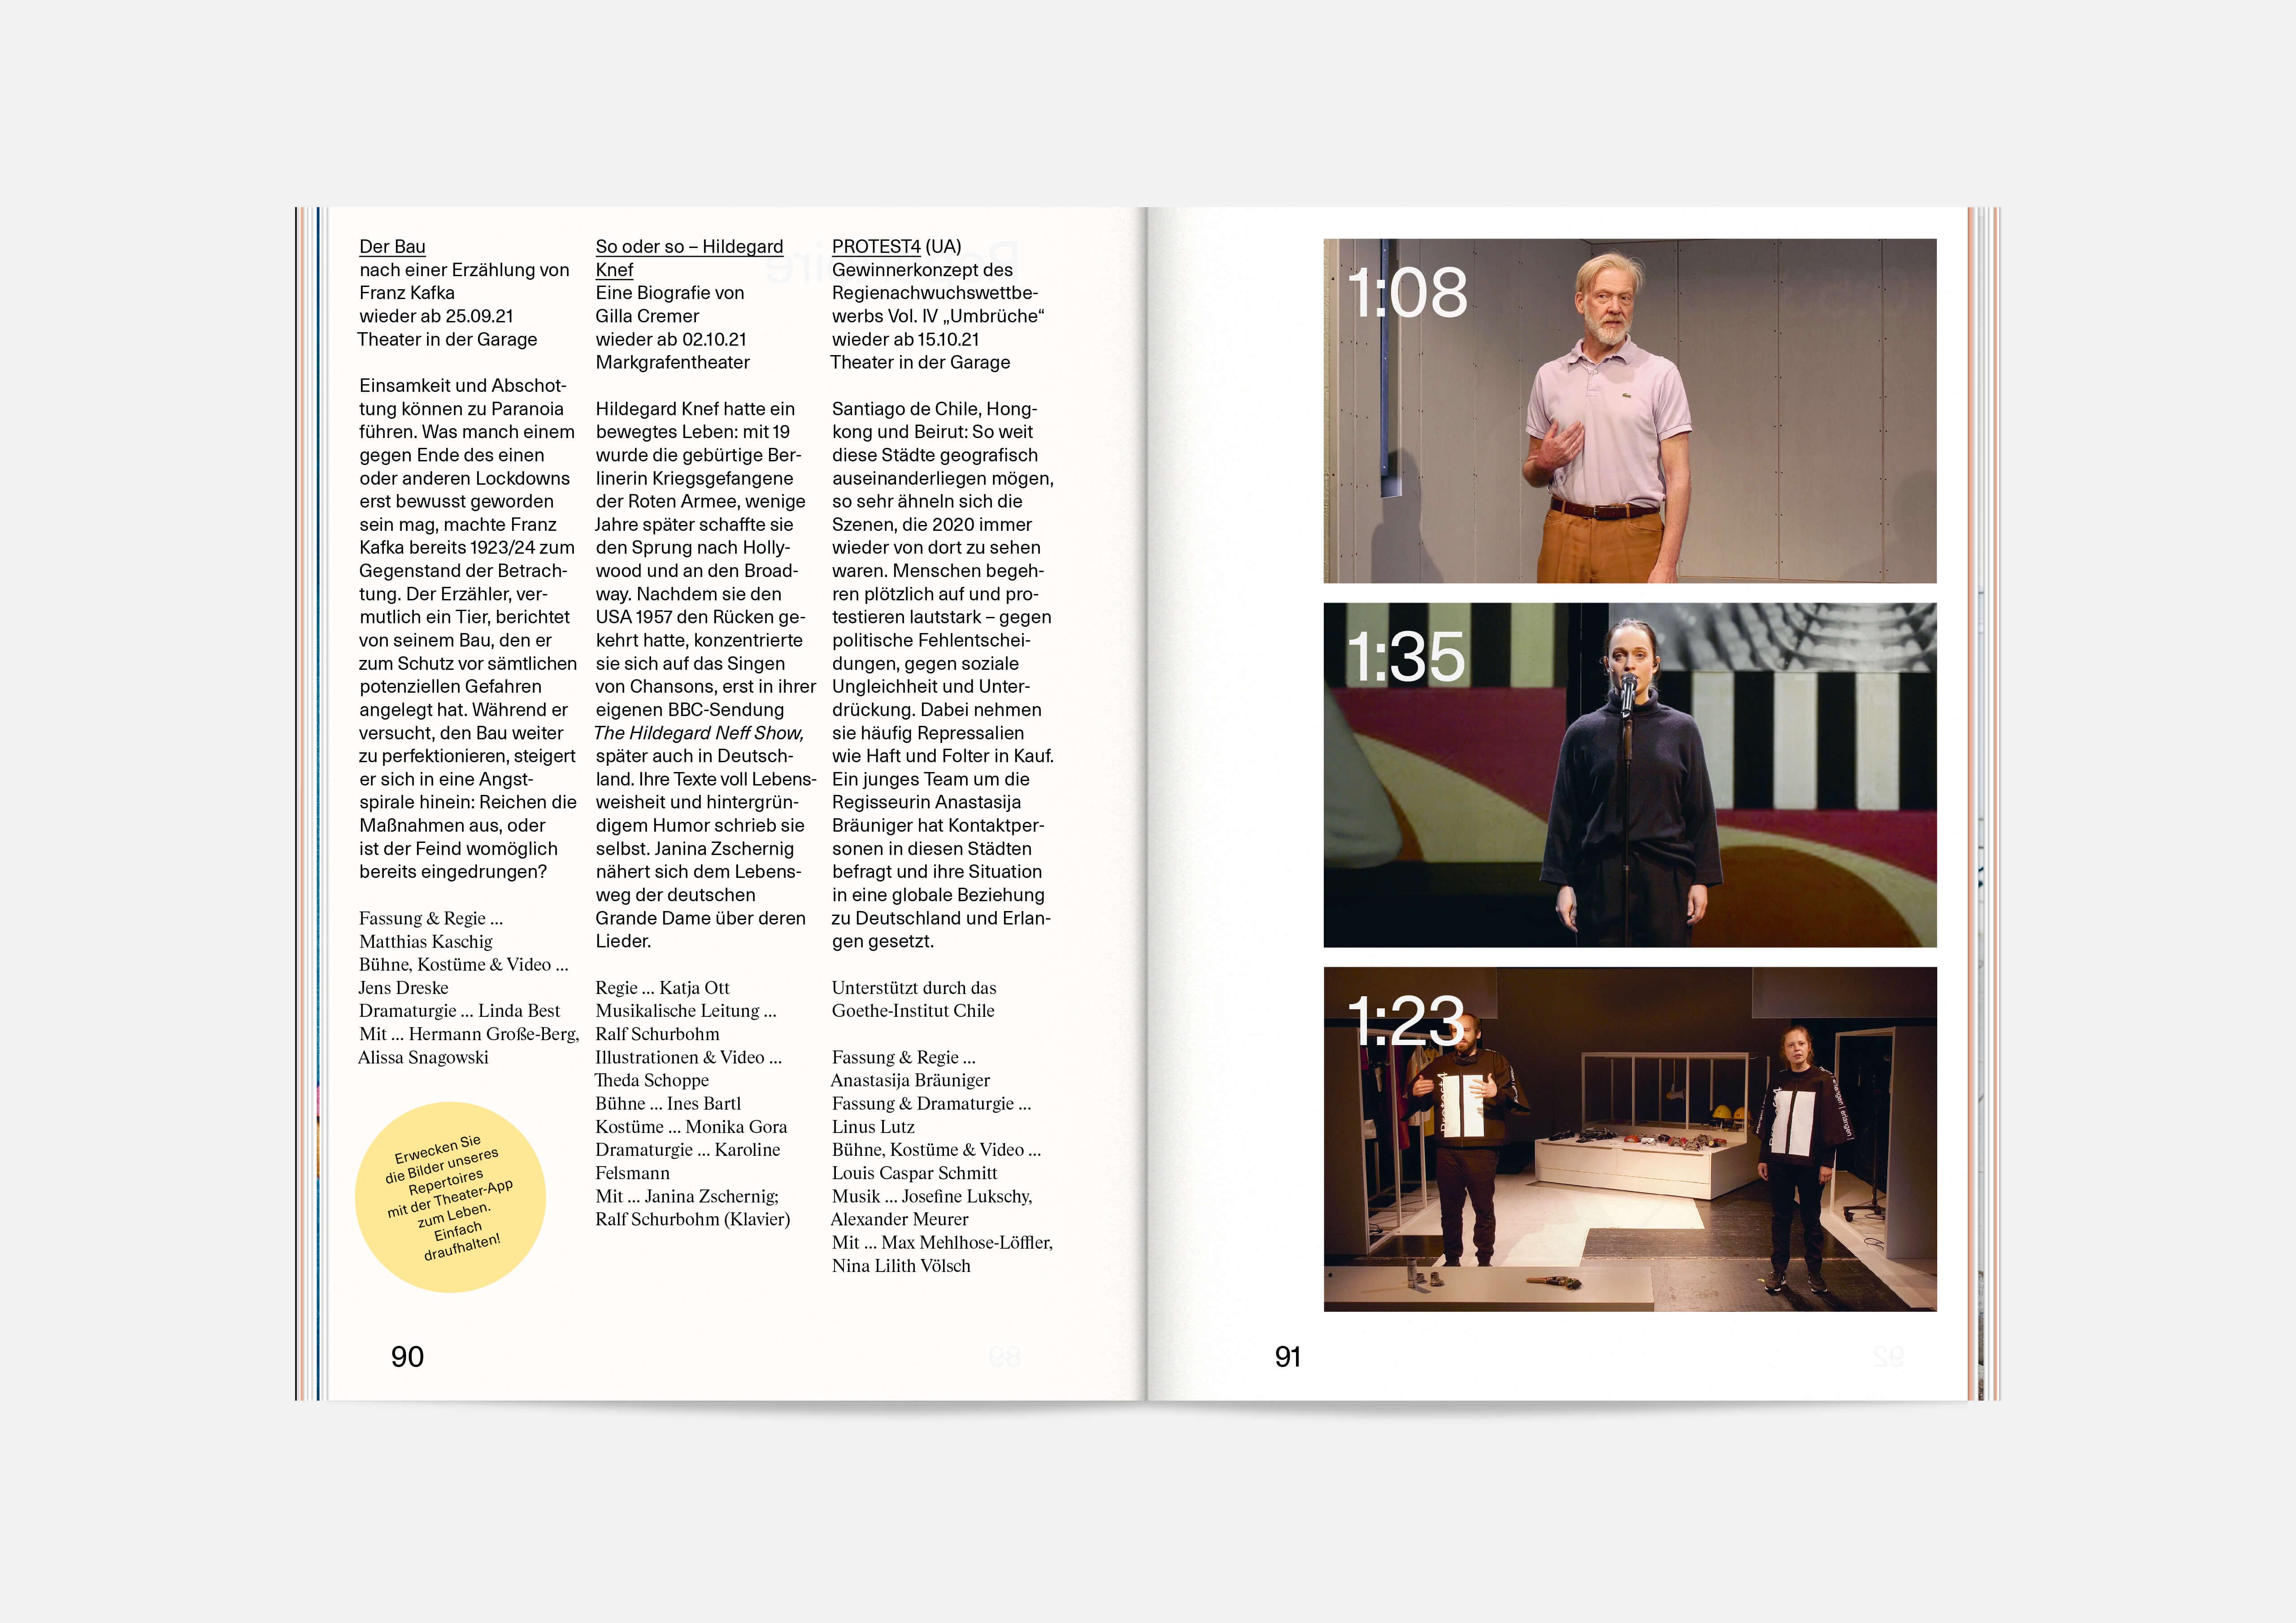 https://neuegestaltung.de/media/pages/clients/theater-erlangen-seasonal-program-2021-22/19457b6159-1630497301/te-szh-202122_24.jpg